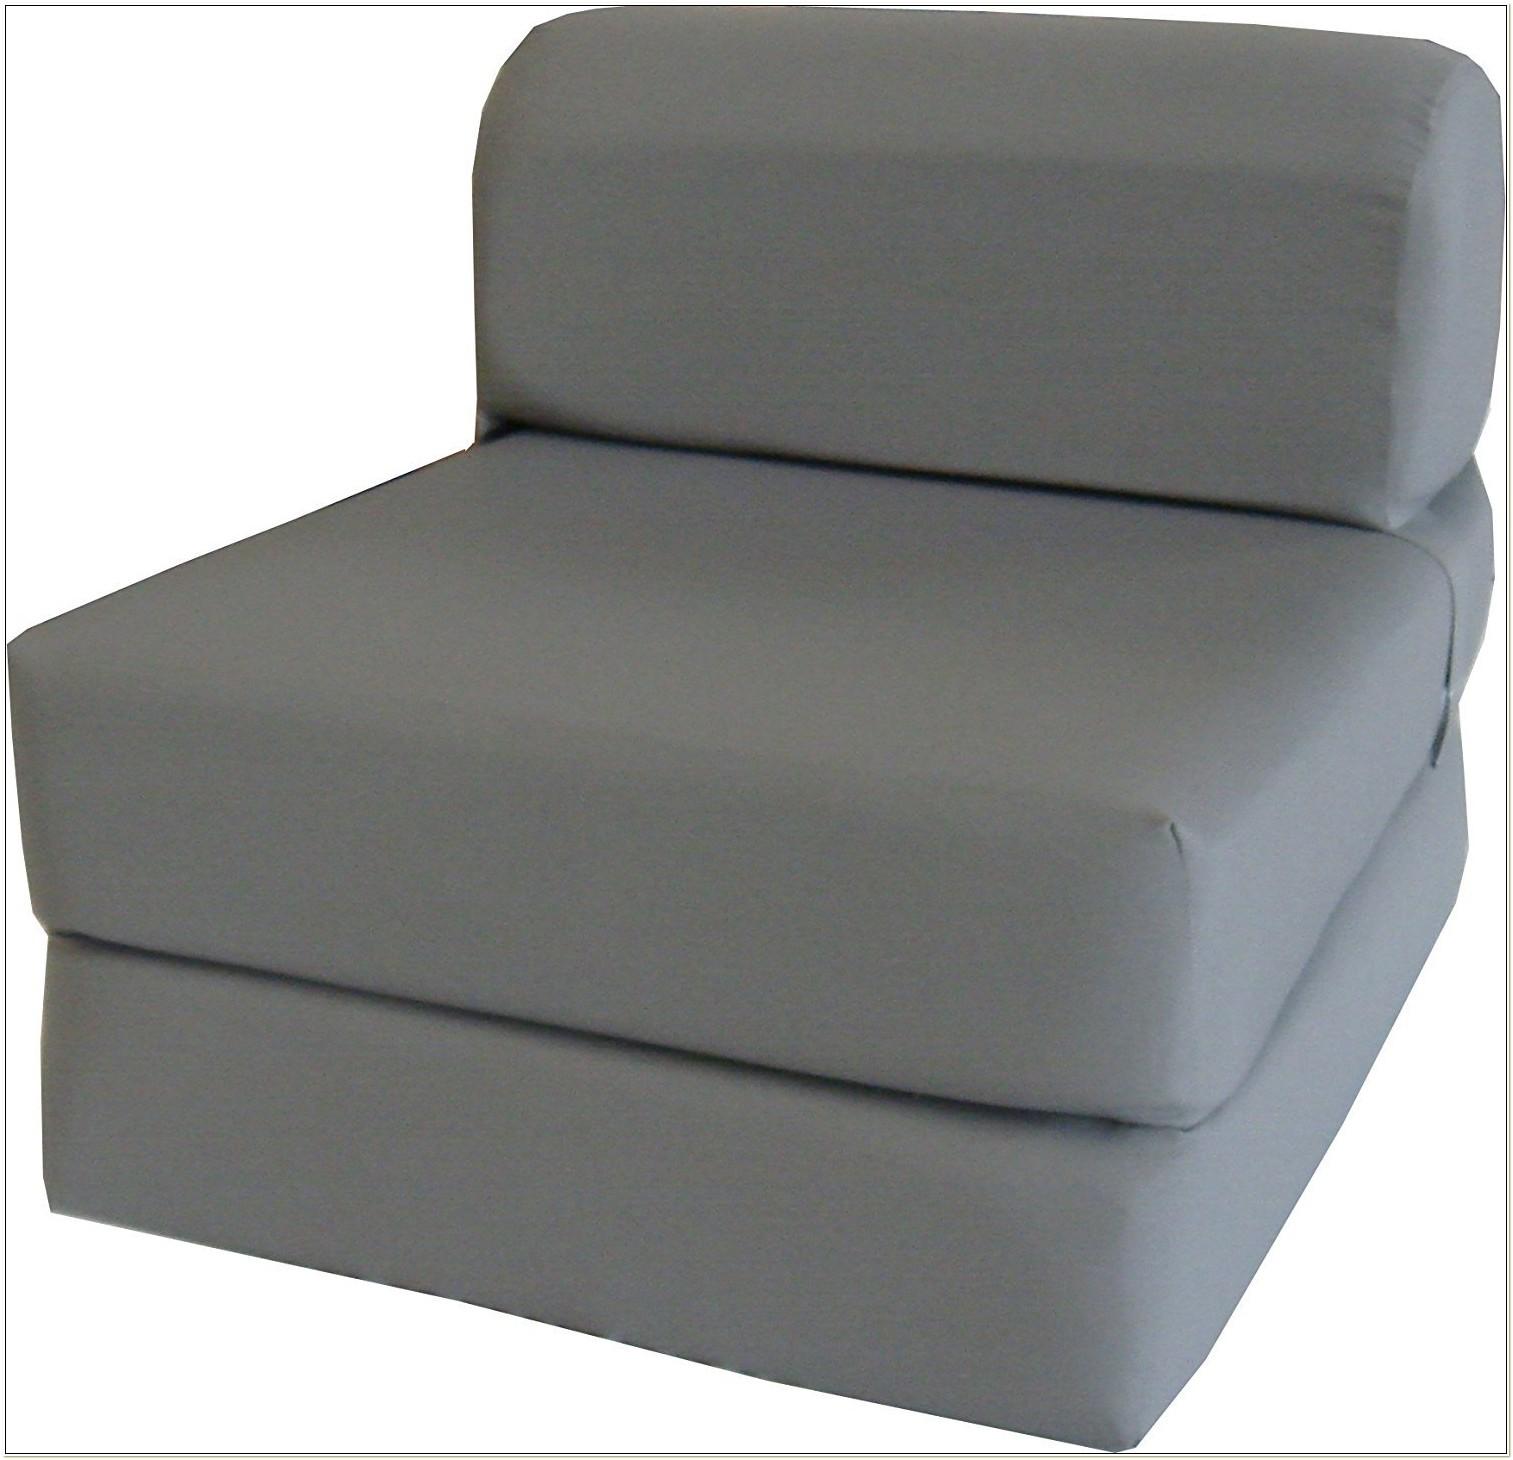 Sleeper Sofa Folding Foam Bed